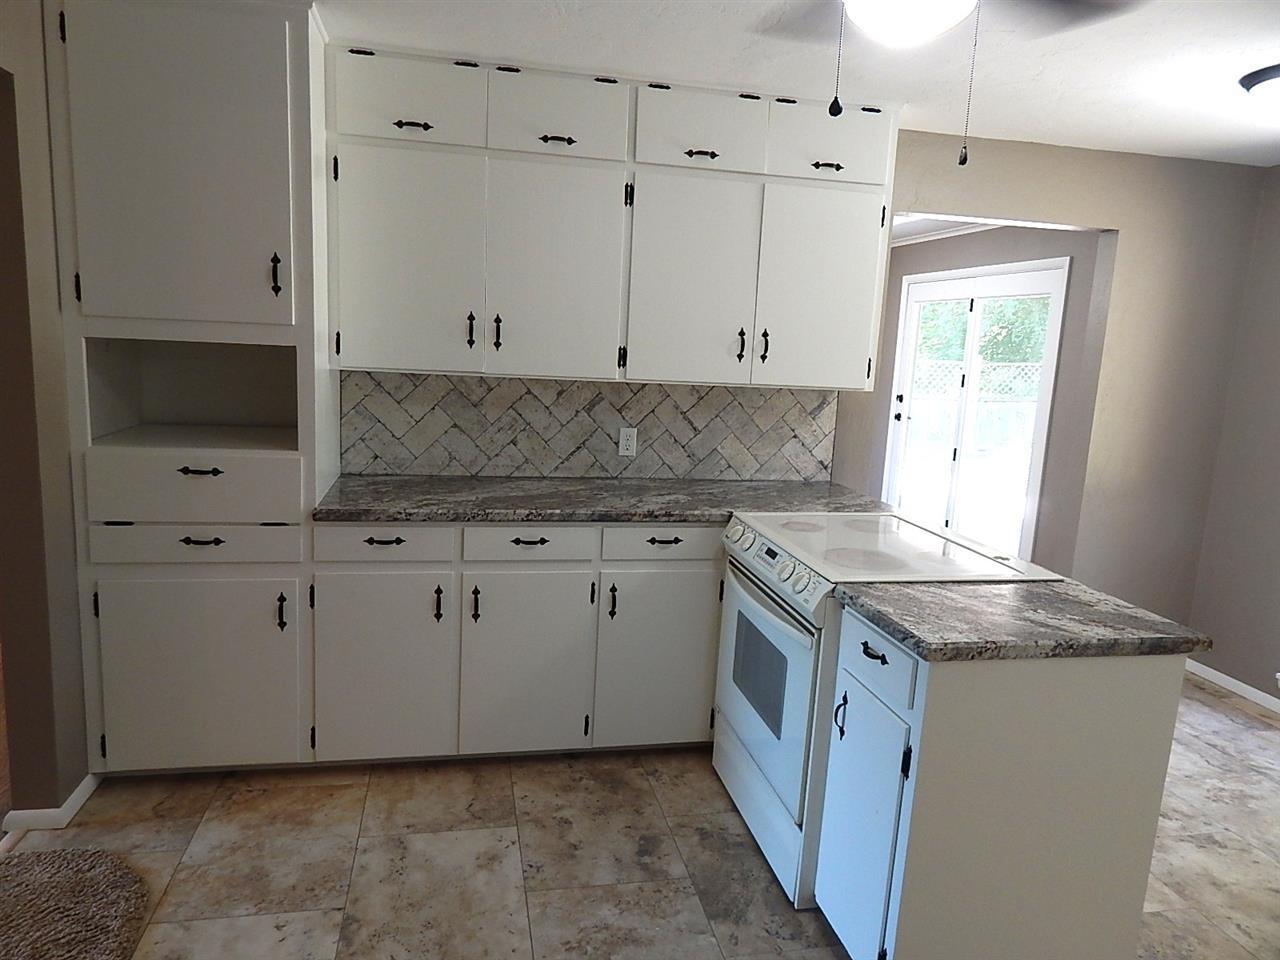 Sold Cross Sale W/ MLS | 1604 Blackard Ponca City, OK 74604 5